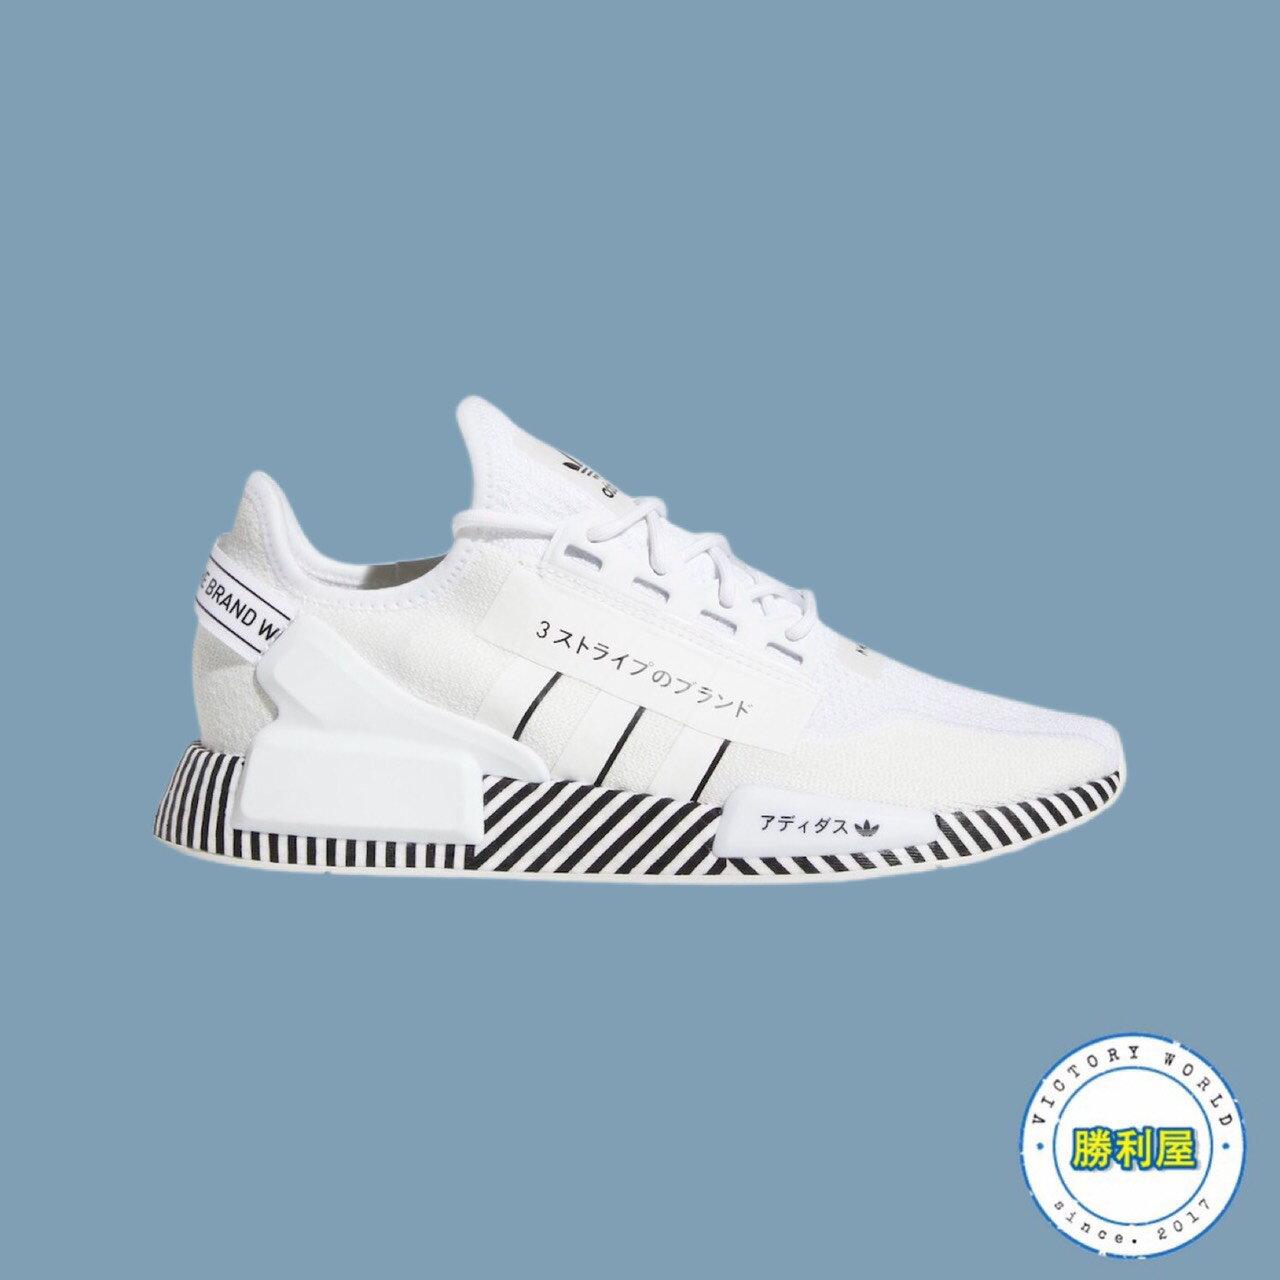 【ADIDAS】NMD R1 V2 TOKYO 男鞋 休閒鞋 白黑 線條 BOOST 日本限定 FY2105【勝利屋】